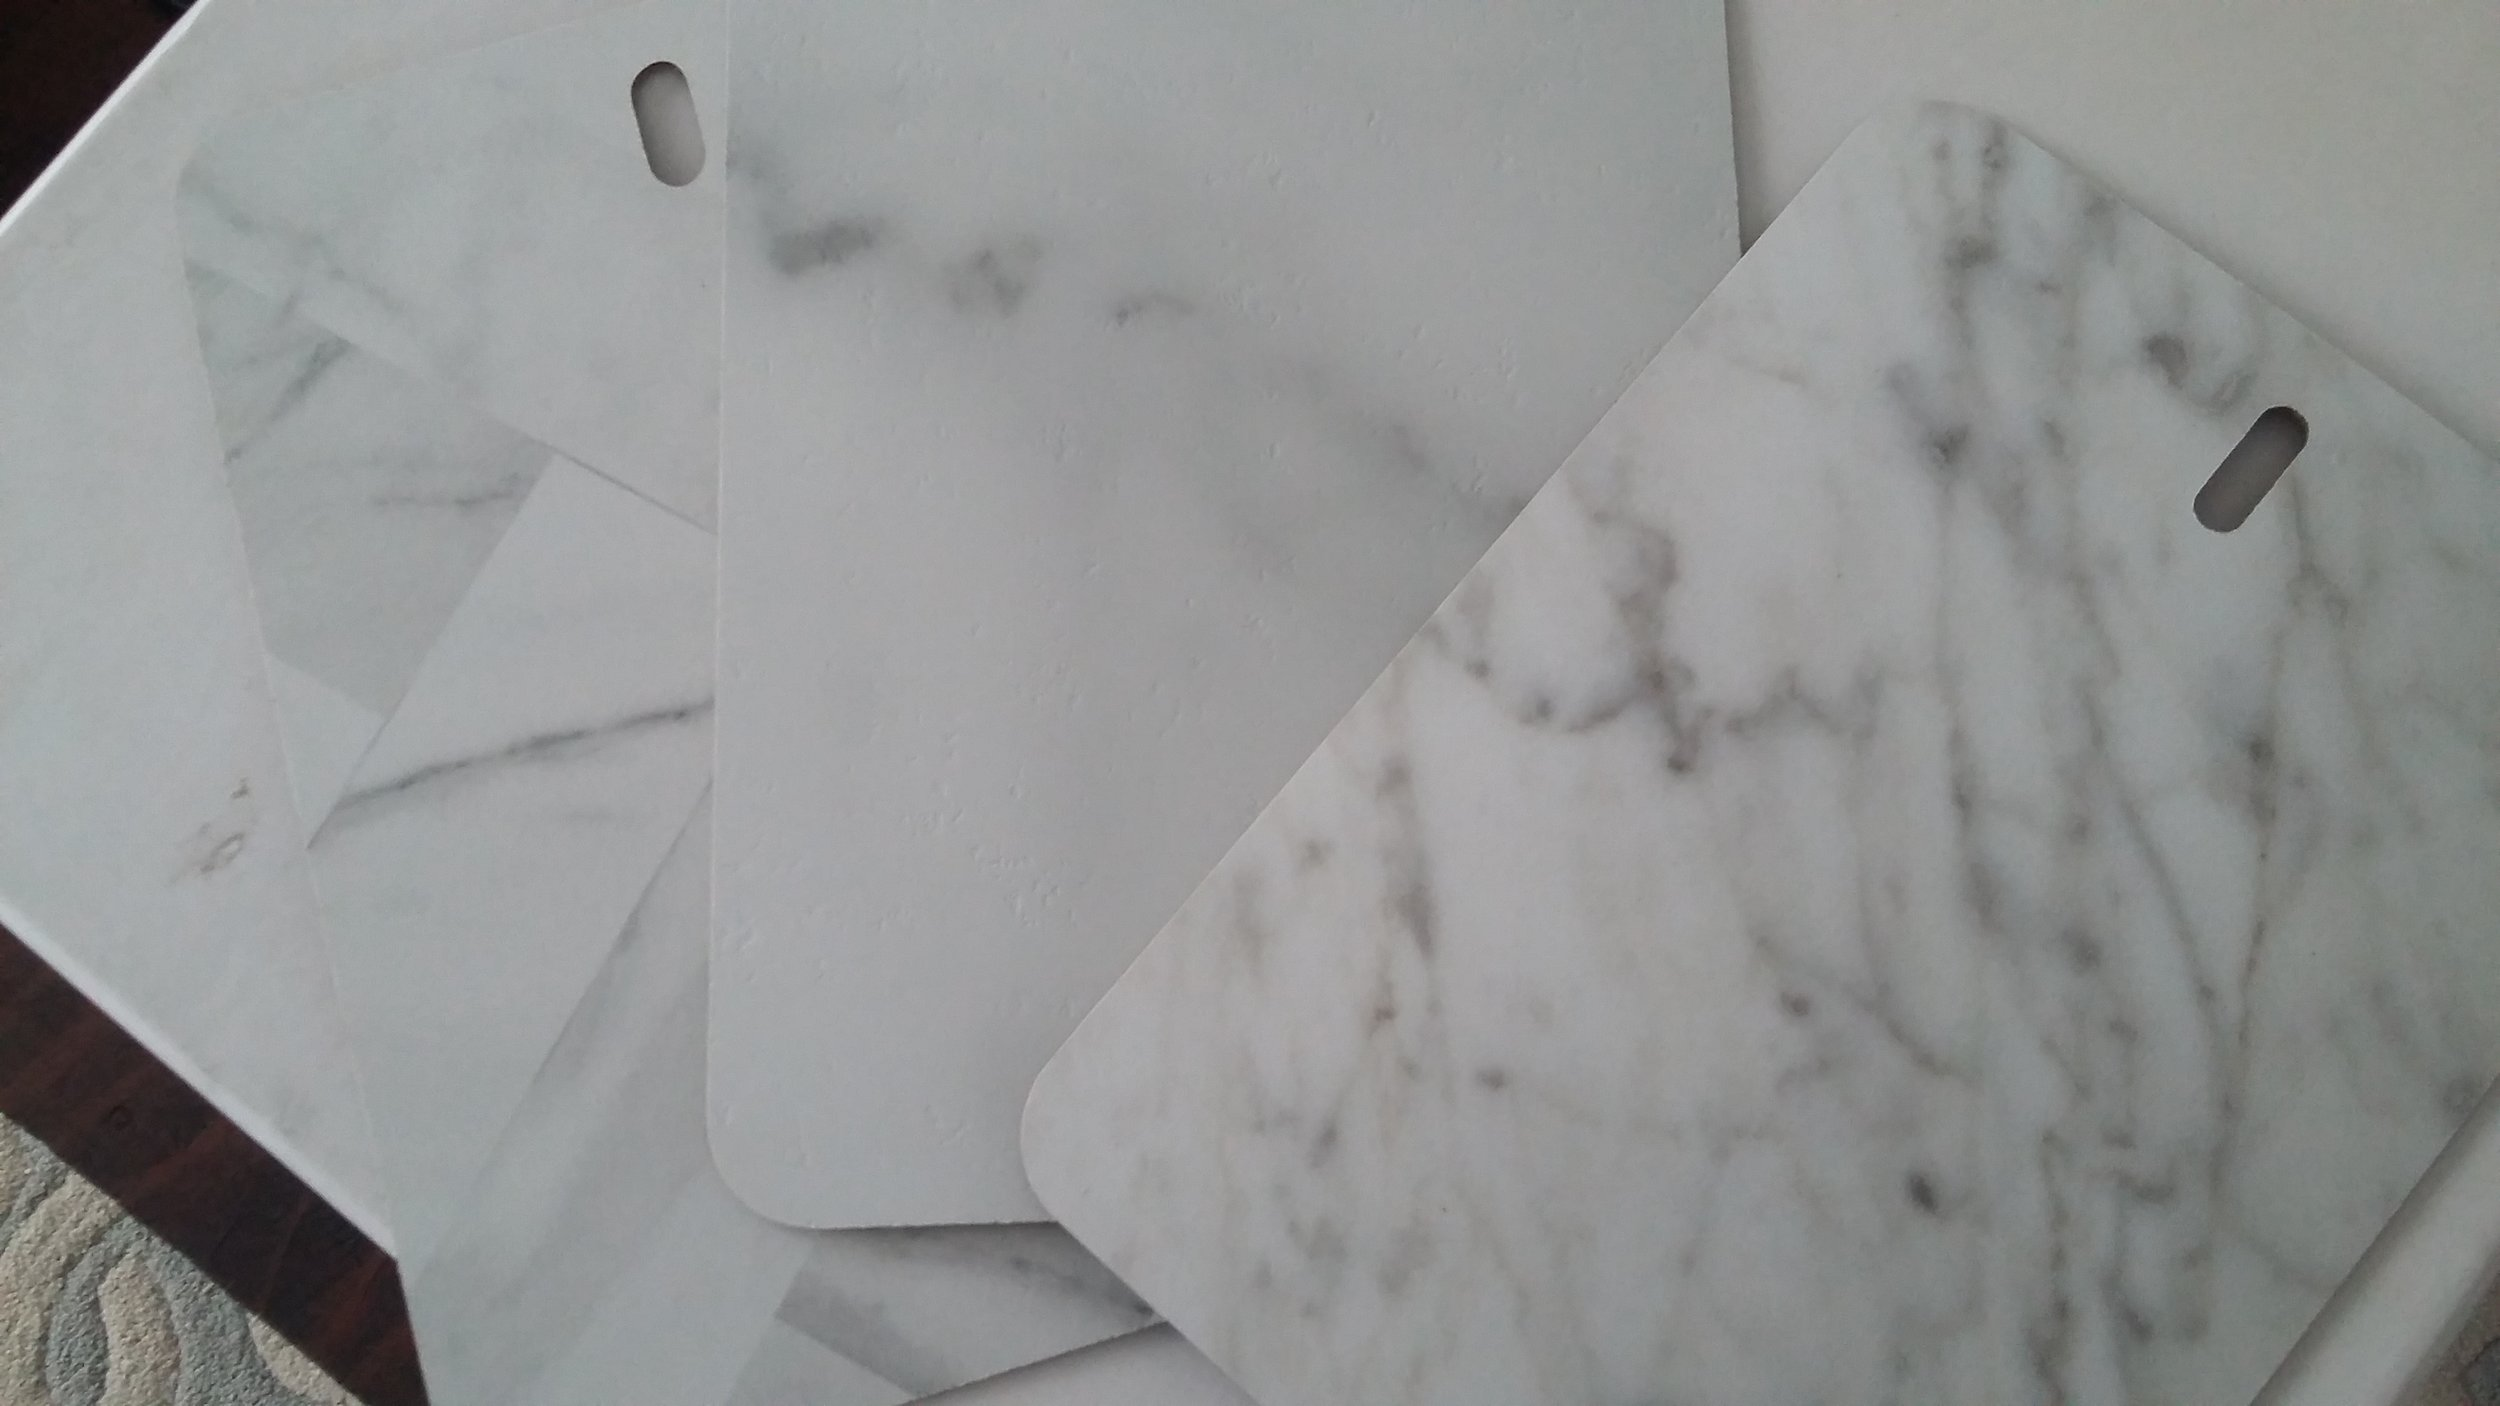 House Flipping - Marble Laminate Countertop   Elizabeth Burns Design